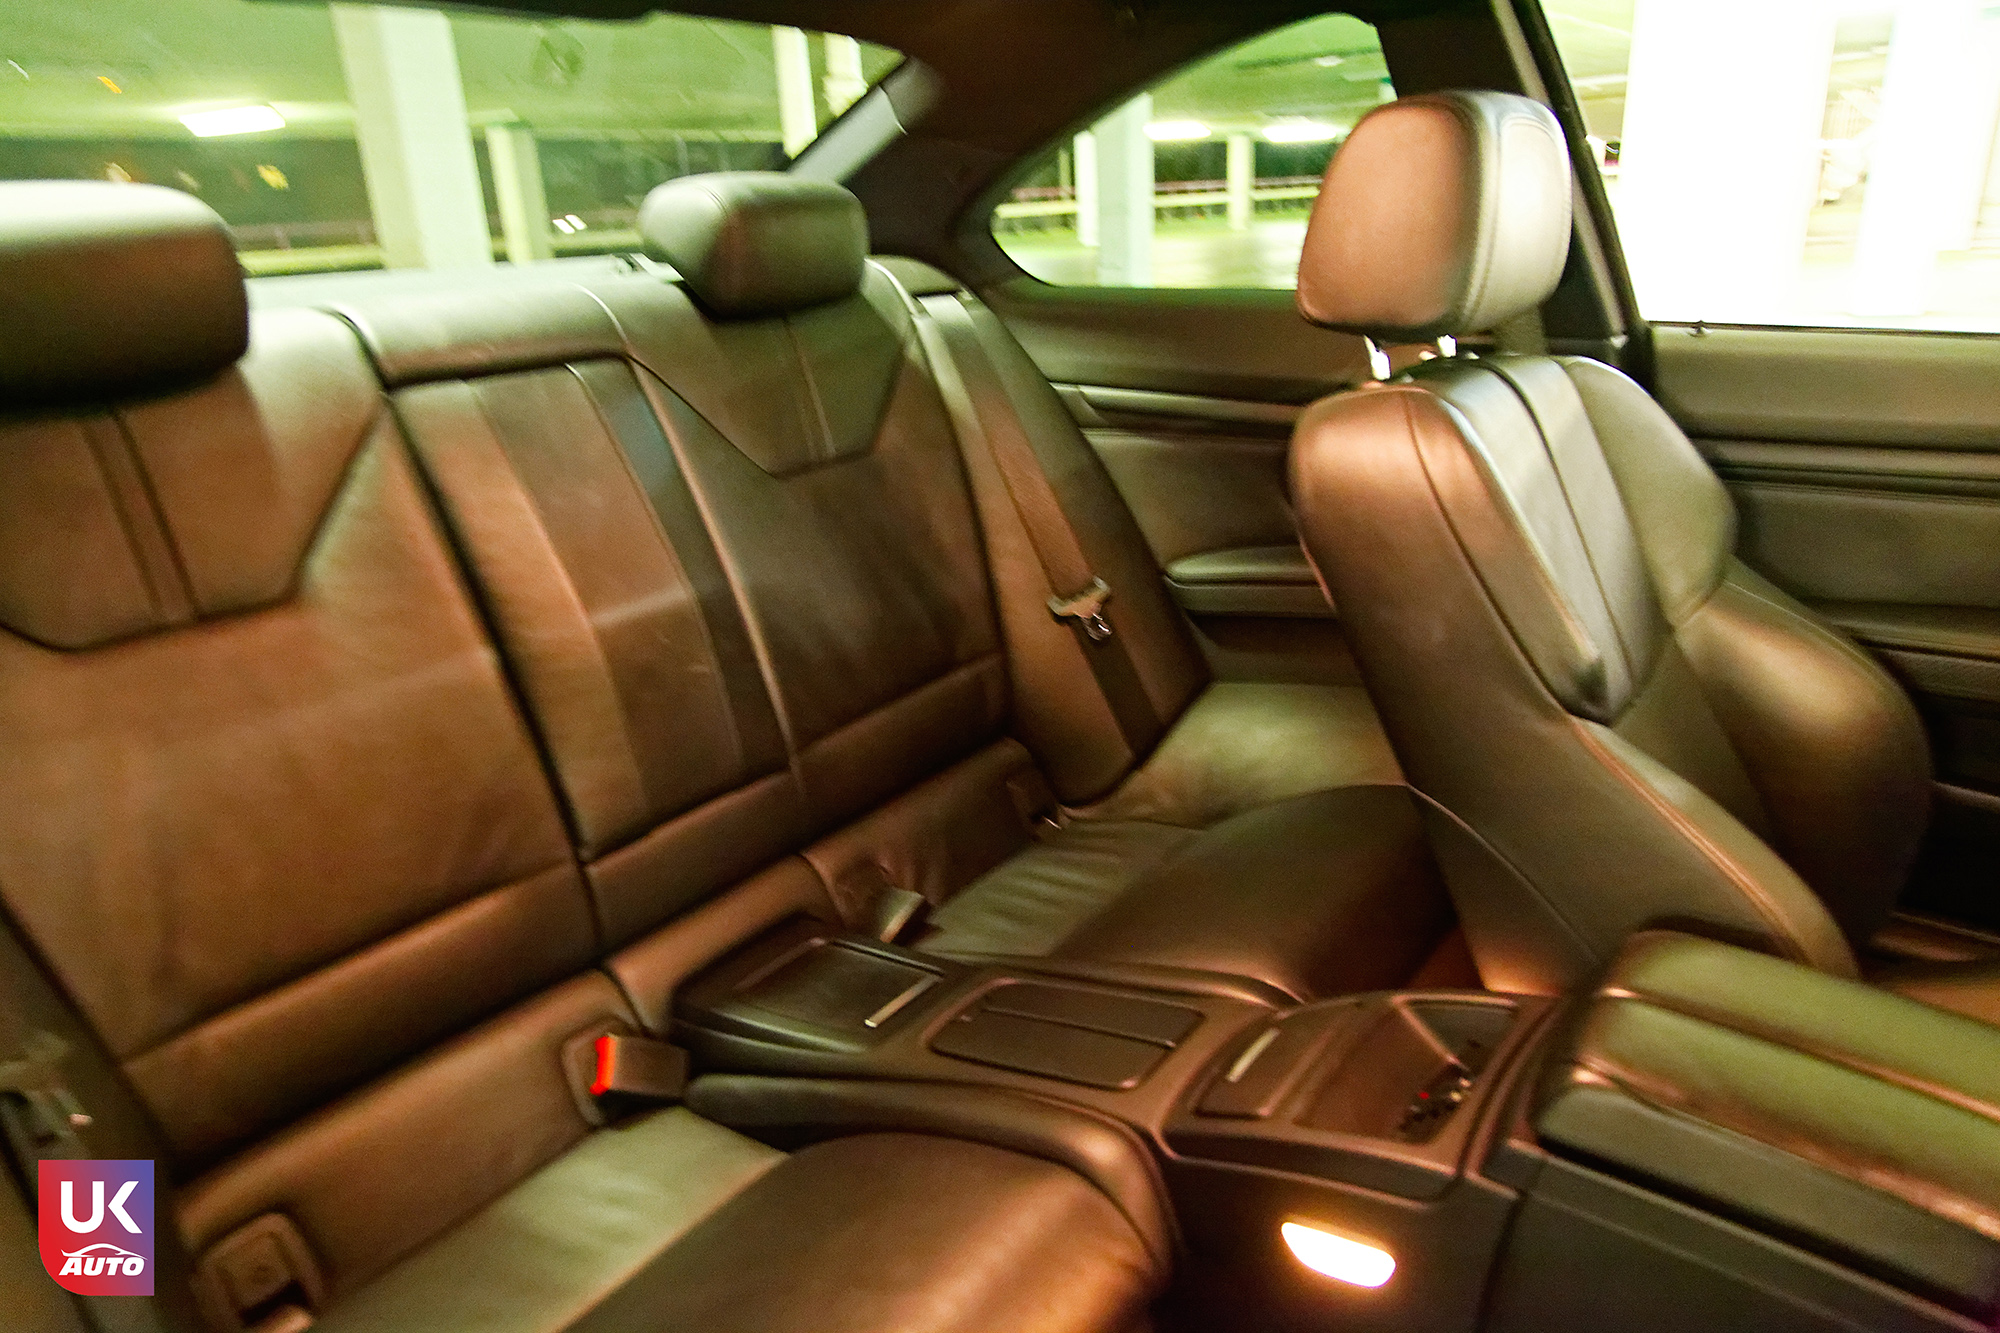 BMW m3 E92 import auto mandataire angleterre uk londres bmw leboncoin achat angleterre bmw voiture anglaise auto rhd e92 uk auto12 - Felecitation a Clement pour cette BMW M3 E92 COUPE RHD PACK CARBON BMW ANGLETERRE VOITURE UK